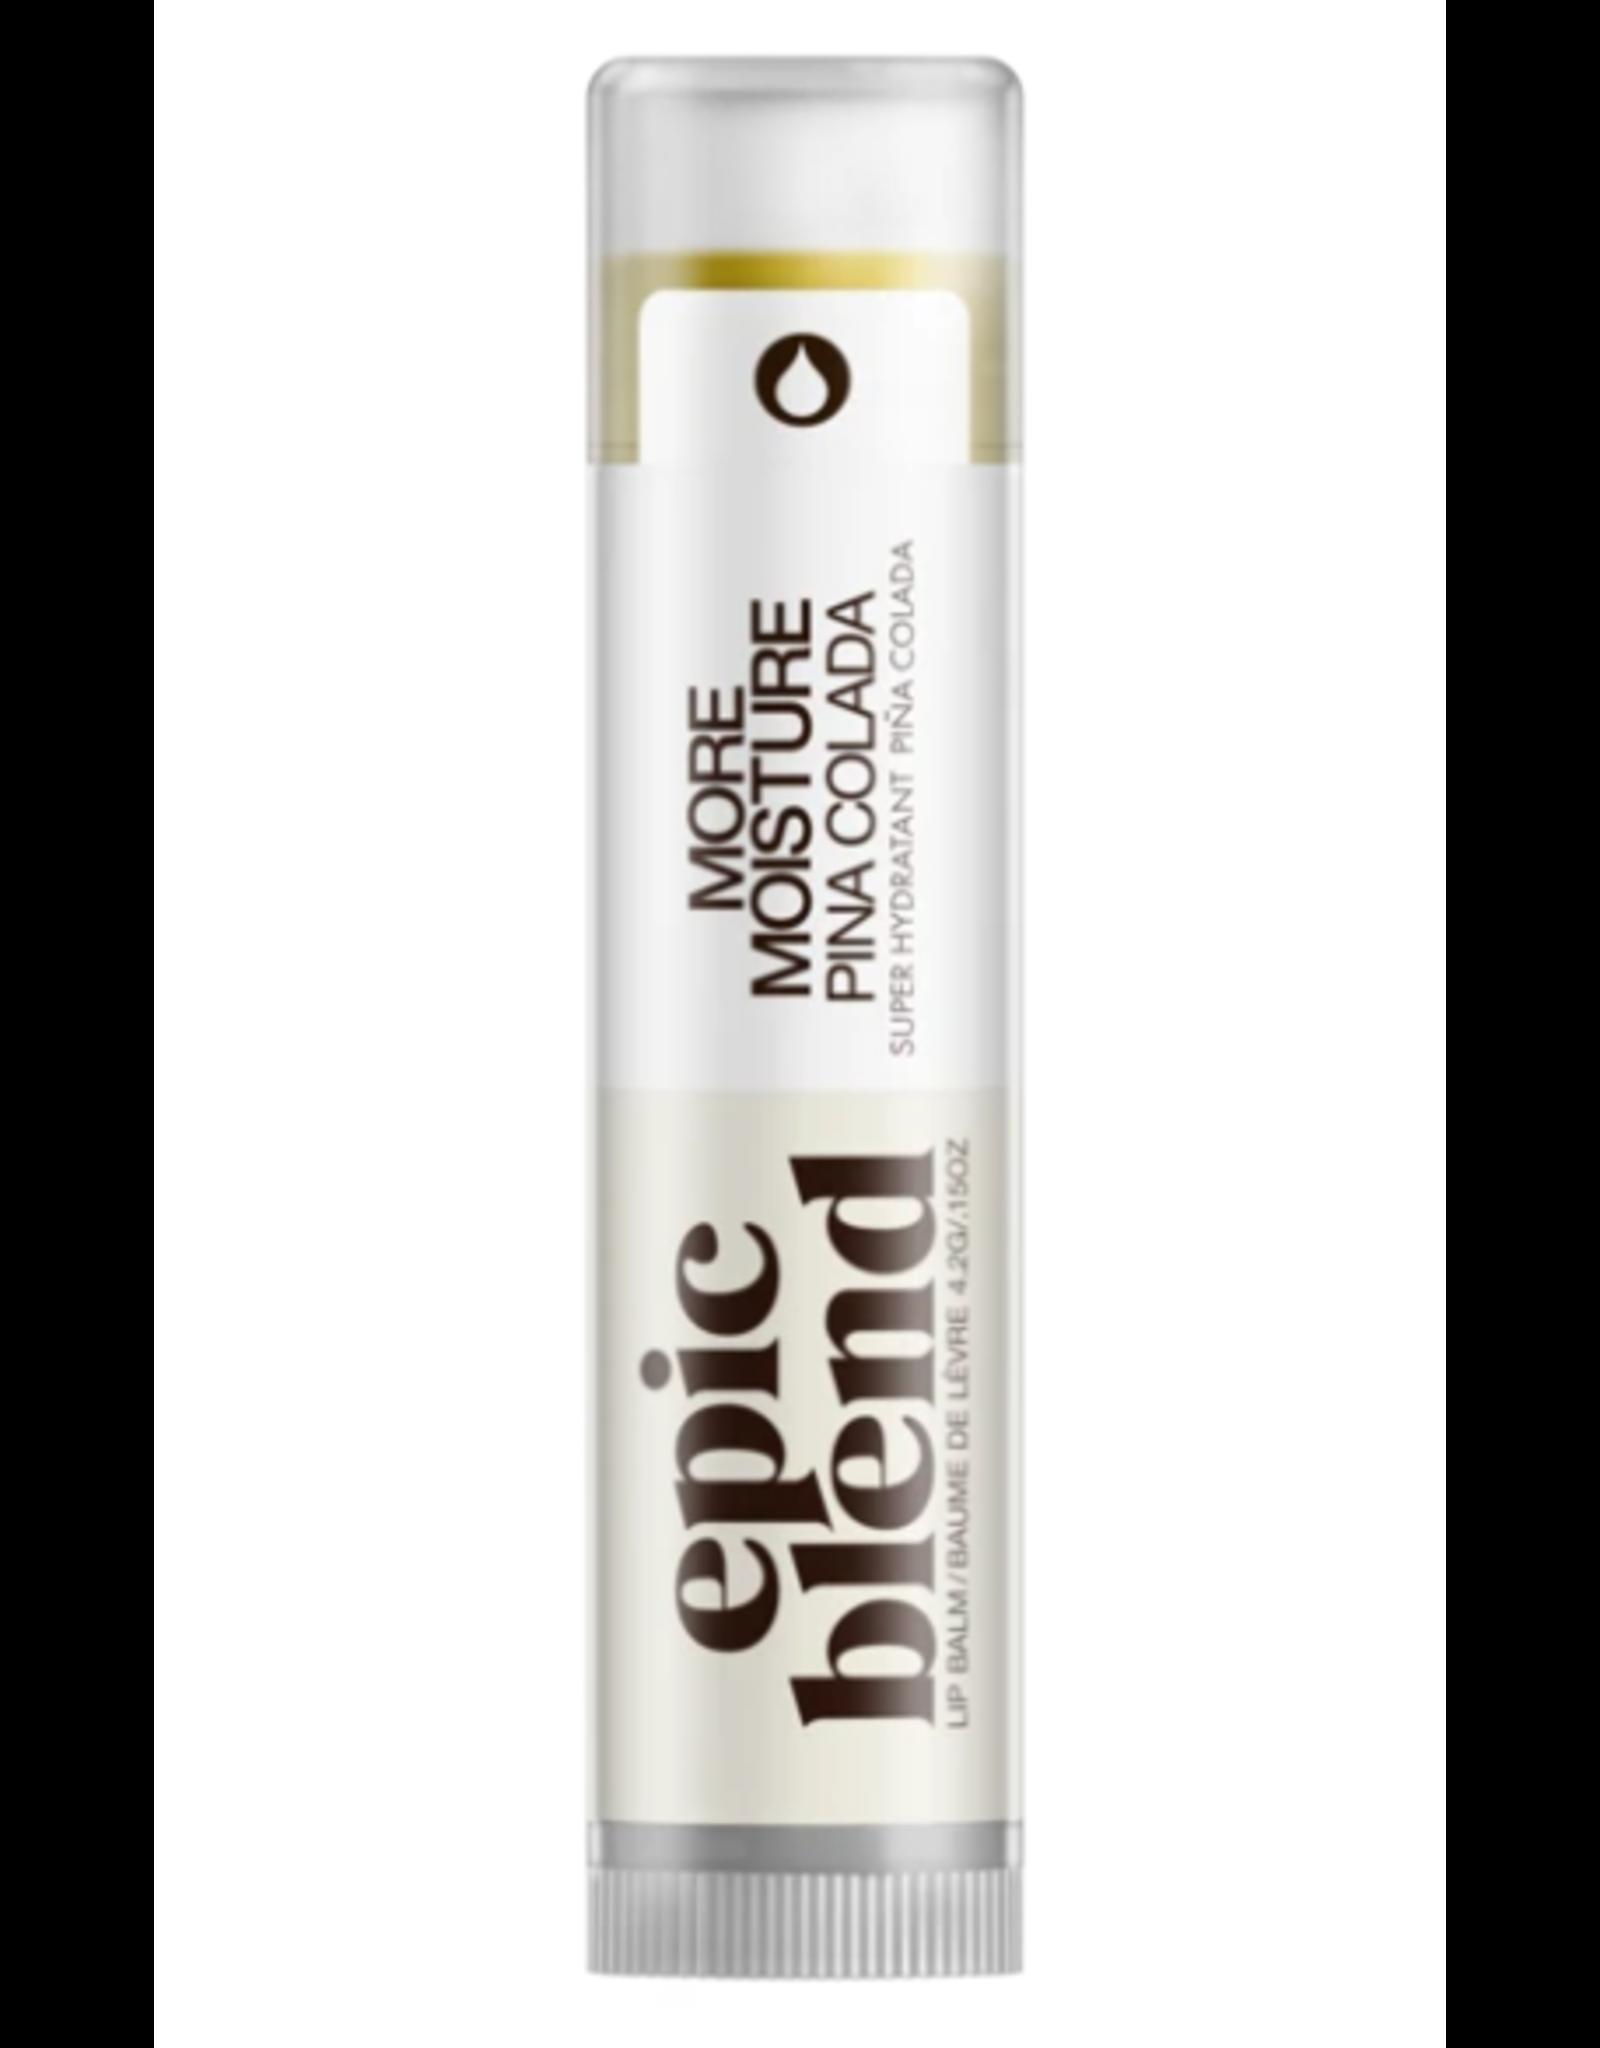 Epic Blend Pina Colada More Moisture Lip Balm